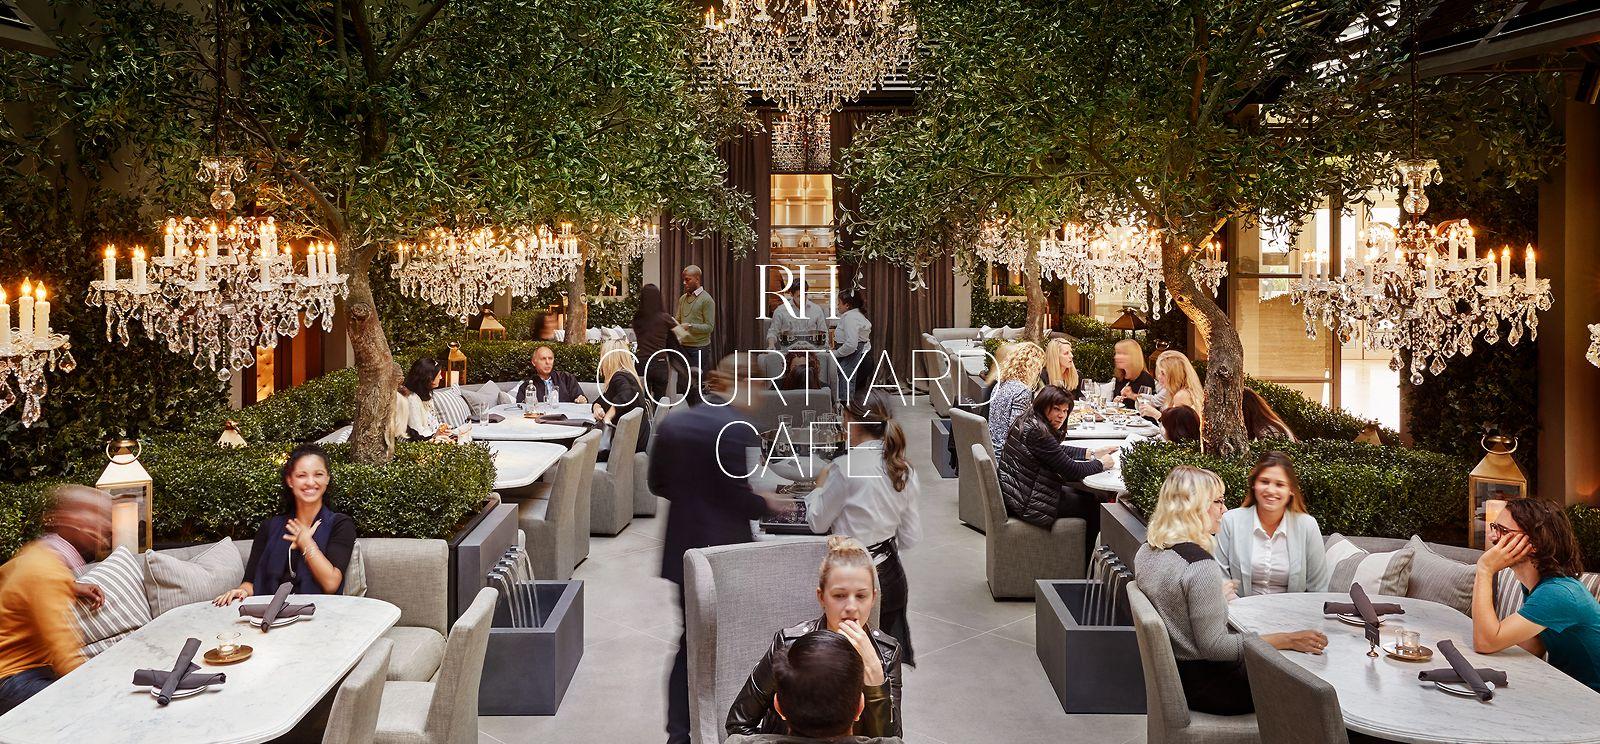 Rh Couryard Cafe